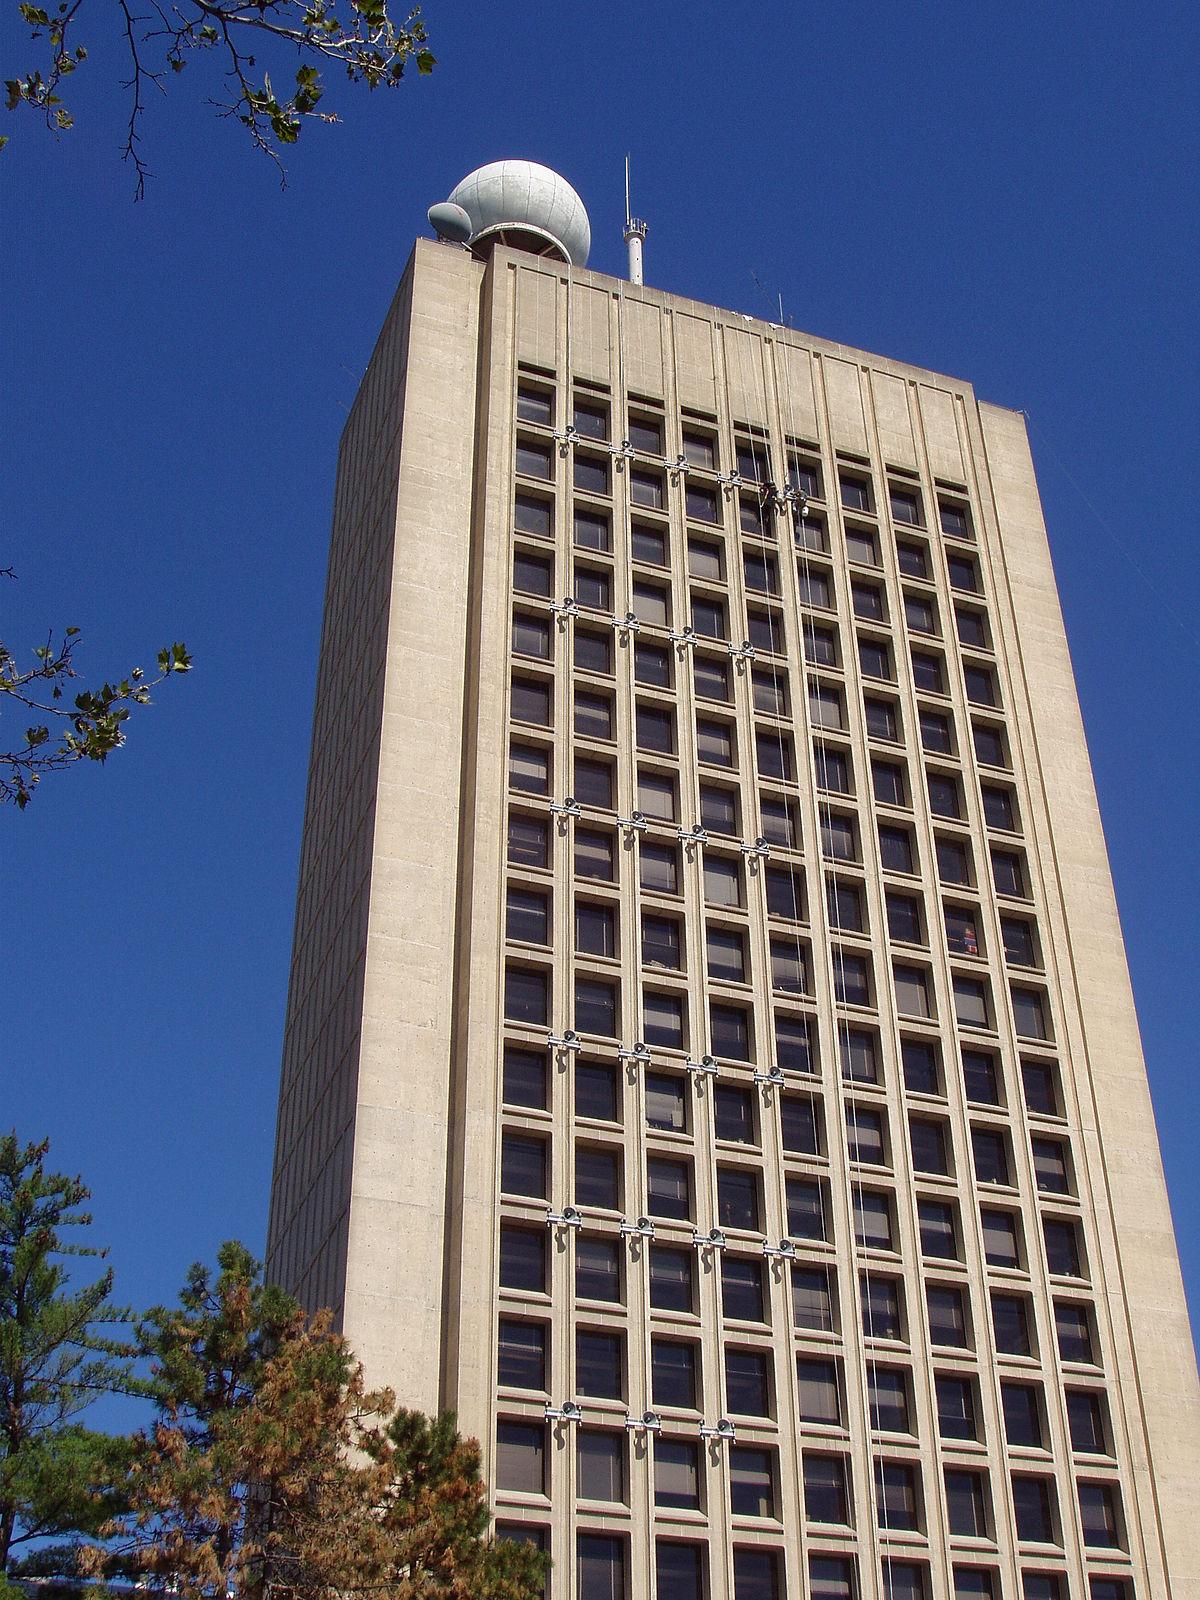 Green Building Mit Wikipedia